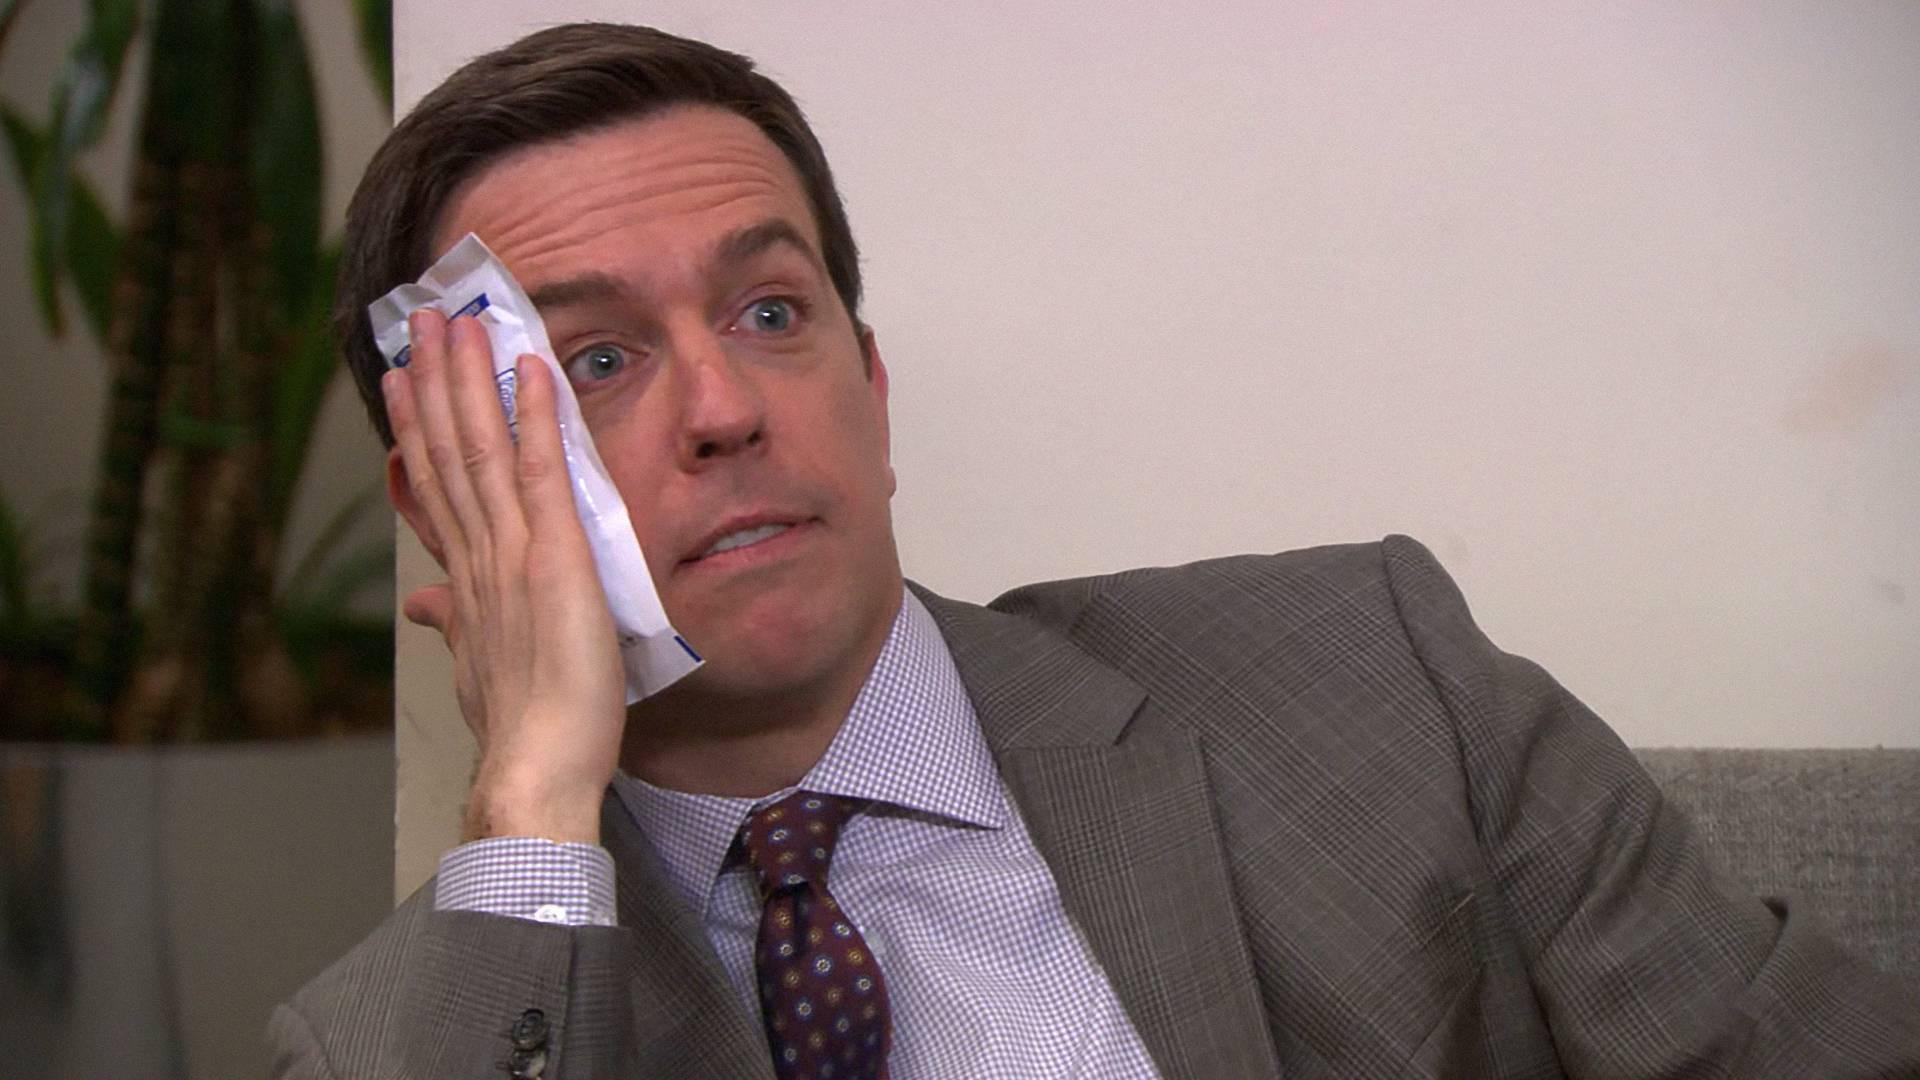 The Office Season 8 Episode 17